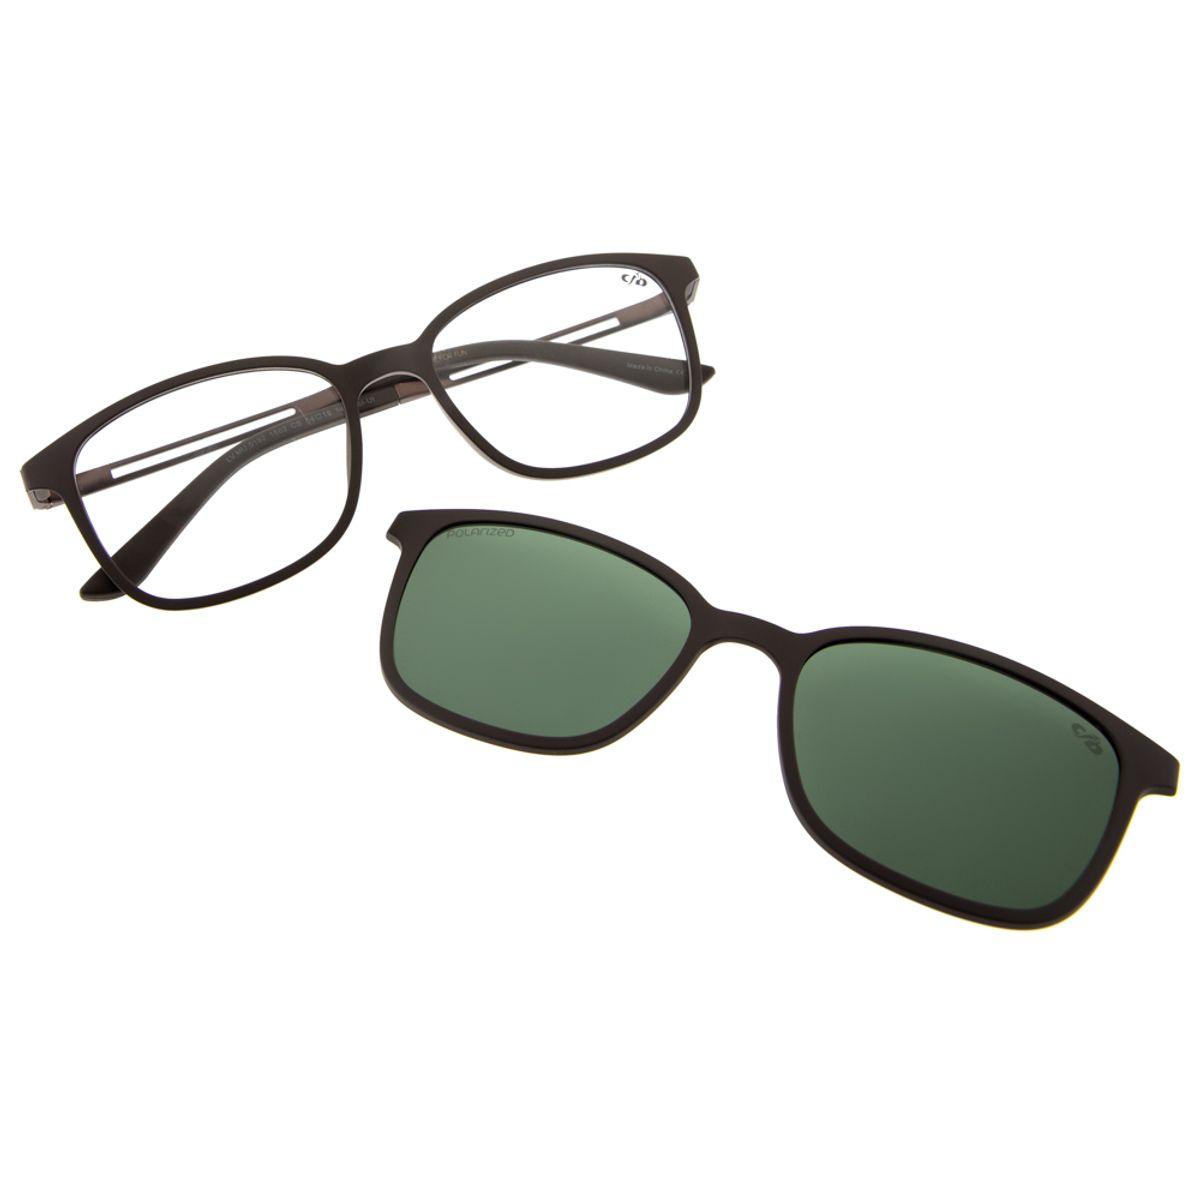 8669bdb90 Armação para Óculos de Grau Chilli Beans Unissex Multi Clip on Polarizado  Marrom 0192 - LV.MU.0192.1502 M. REF: LV.MU.0192.1502. Previous